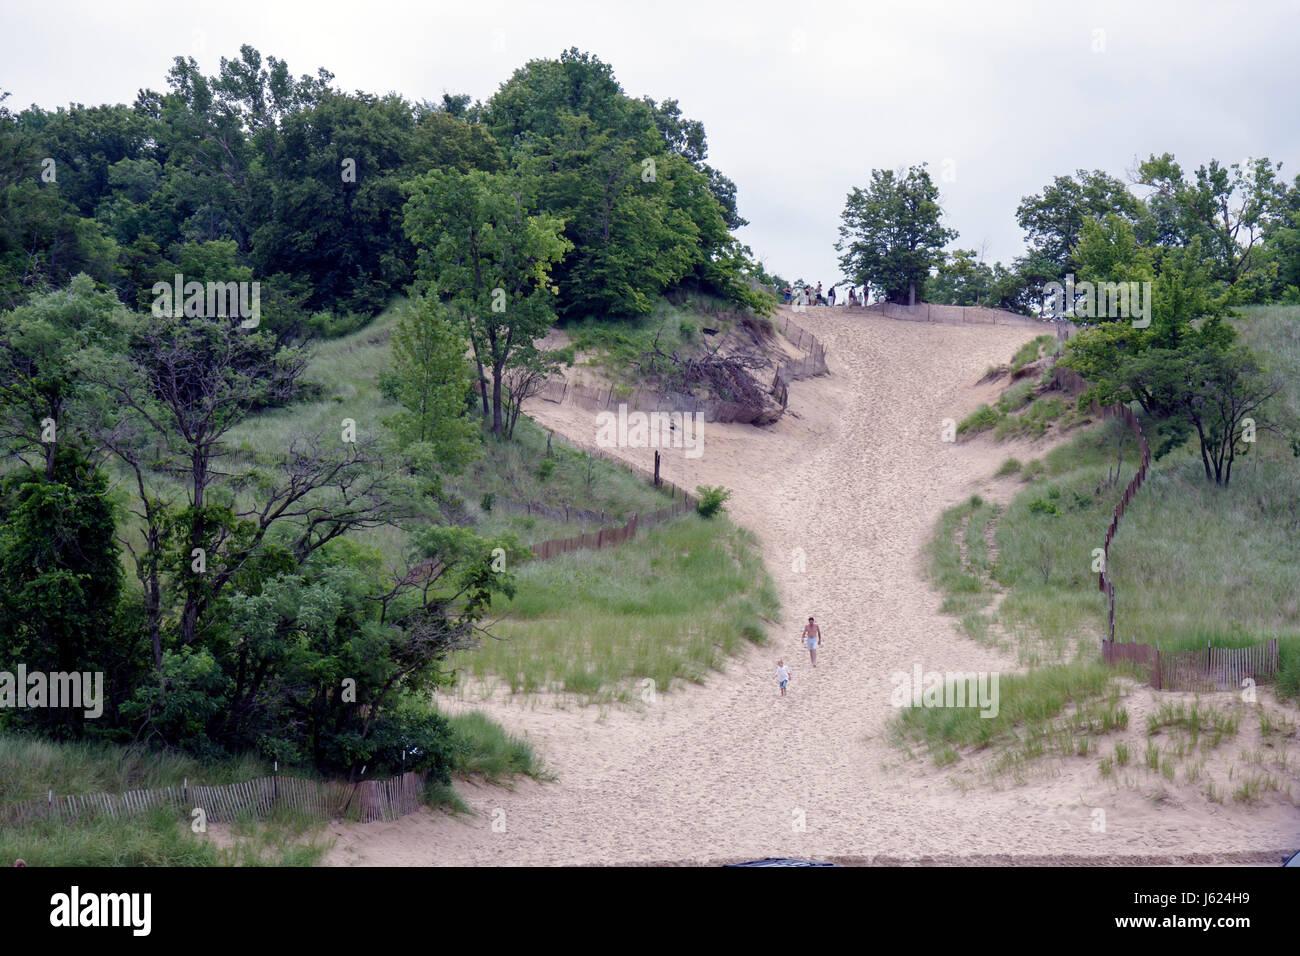 Indiana Chesterton Indiana Dunes State Park Lake Michigan Devil's Slide National Lakeshore Nature Preserve protected - Stock Image